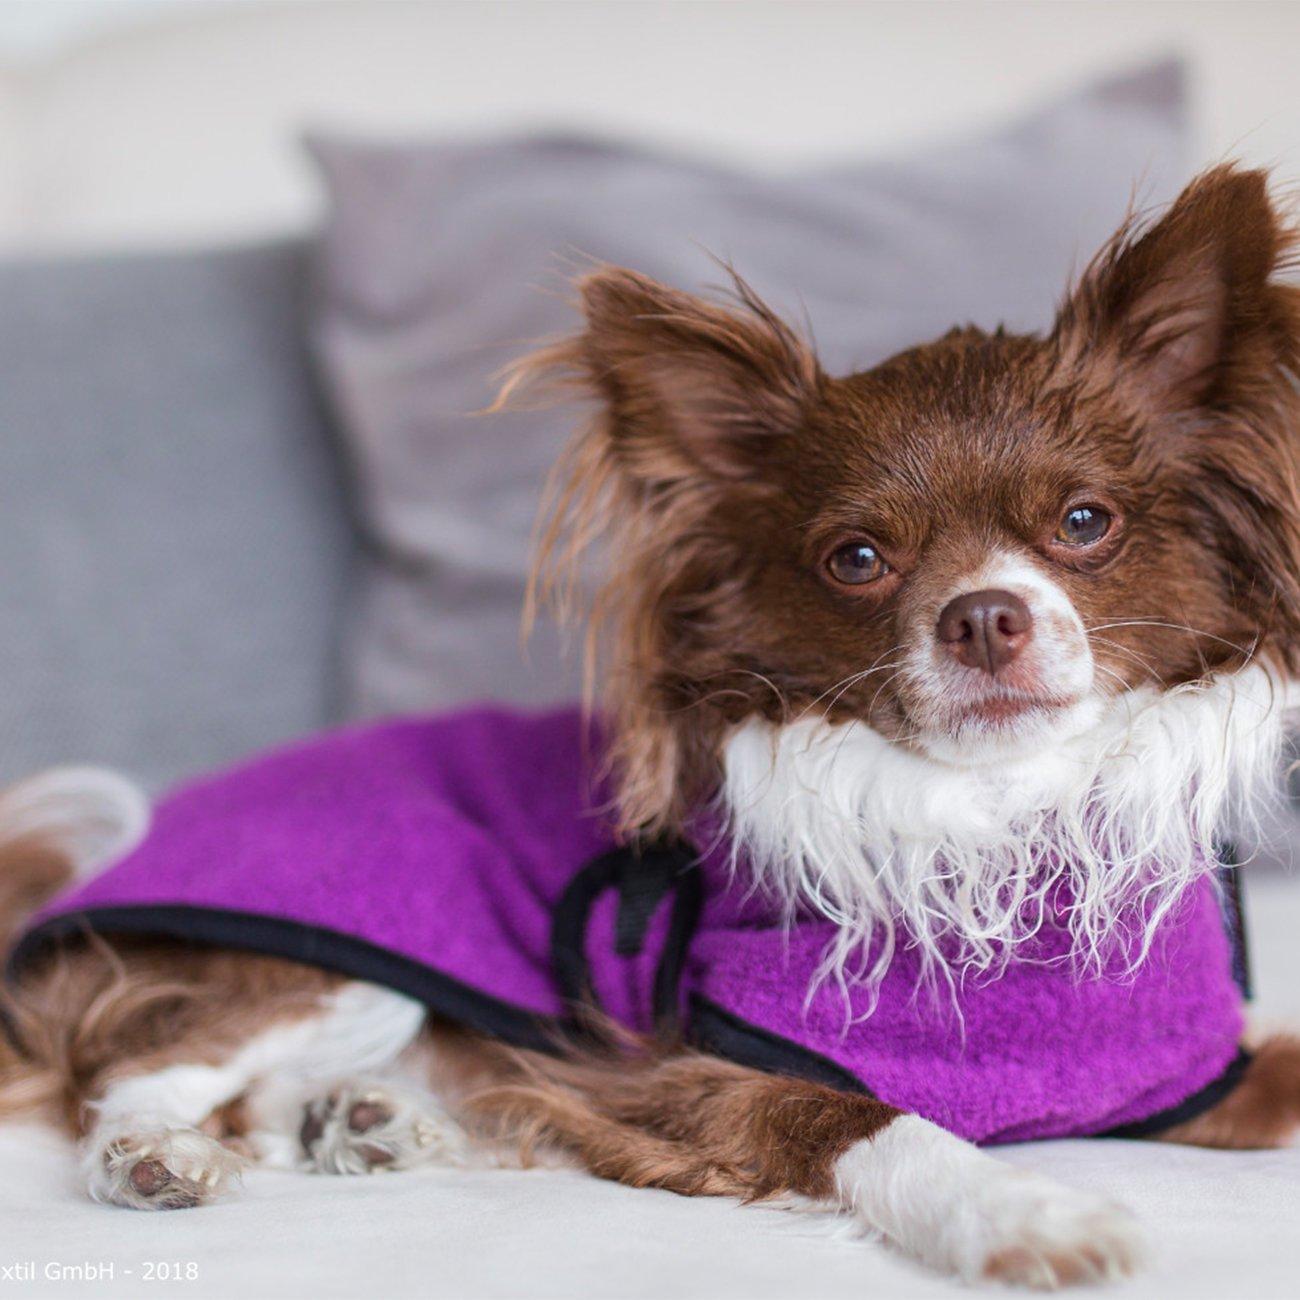 ActionFactory fit4dogs Dryup Mini Trockenmantel für Hunde, Bild 5